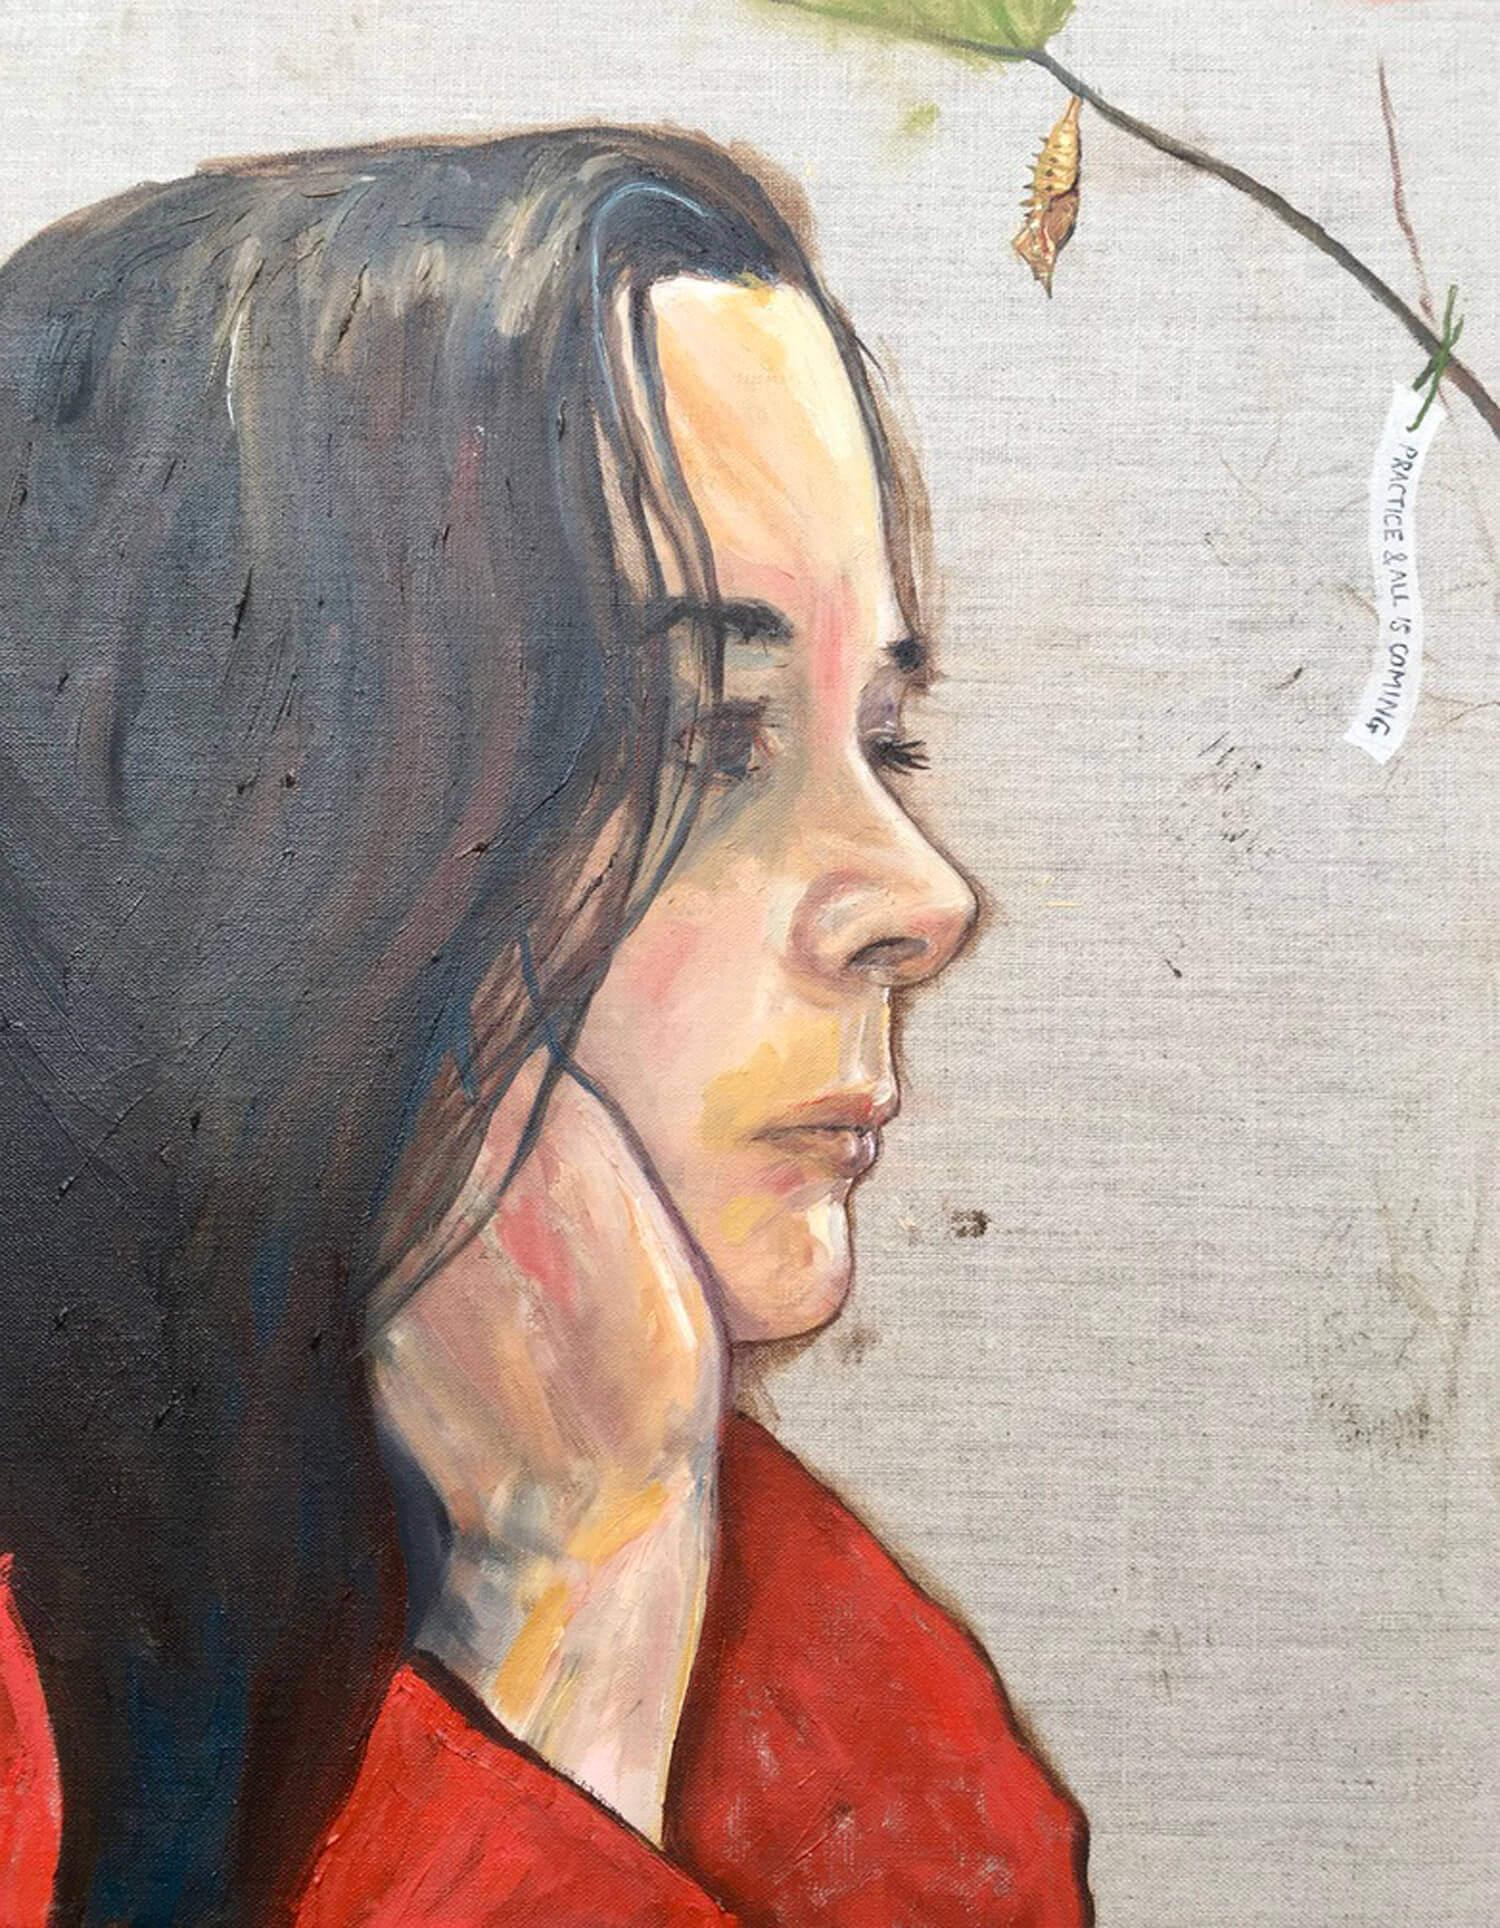 Creatives Talk Shop English language School for creative minds Artist Johanna McWeeney